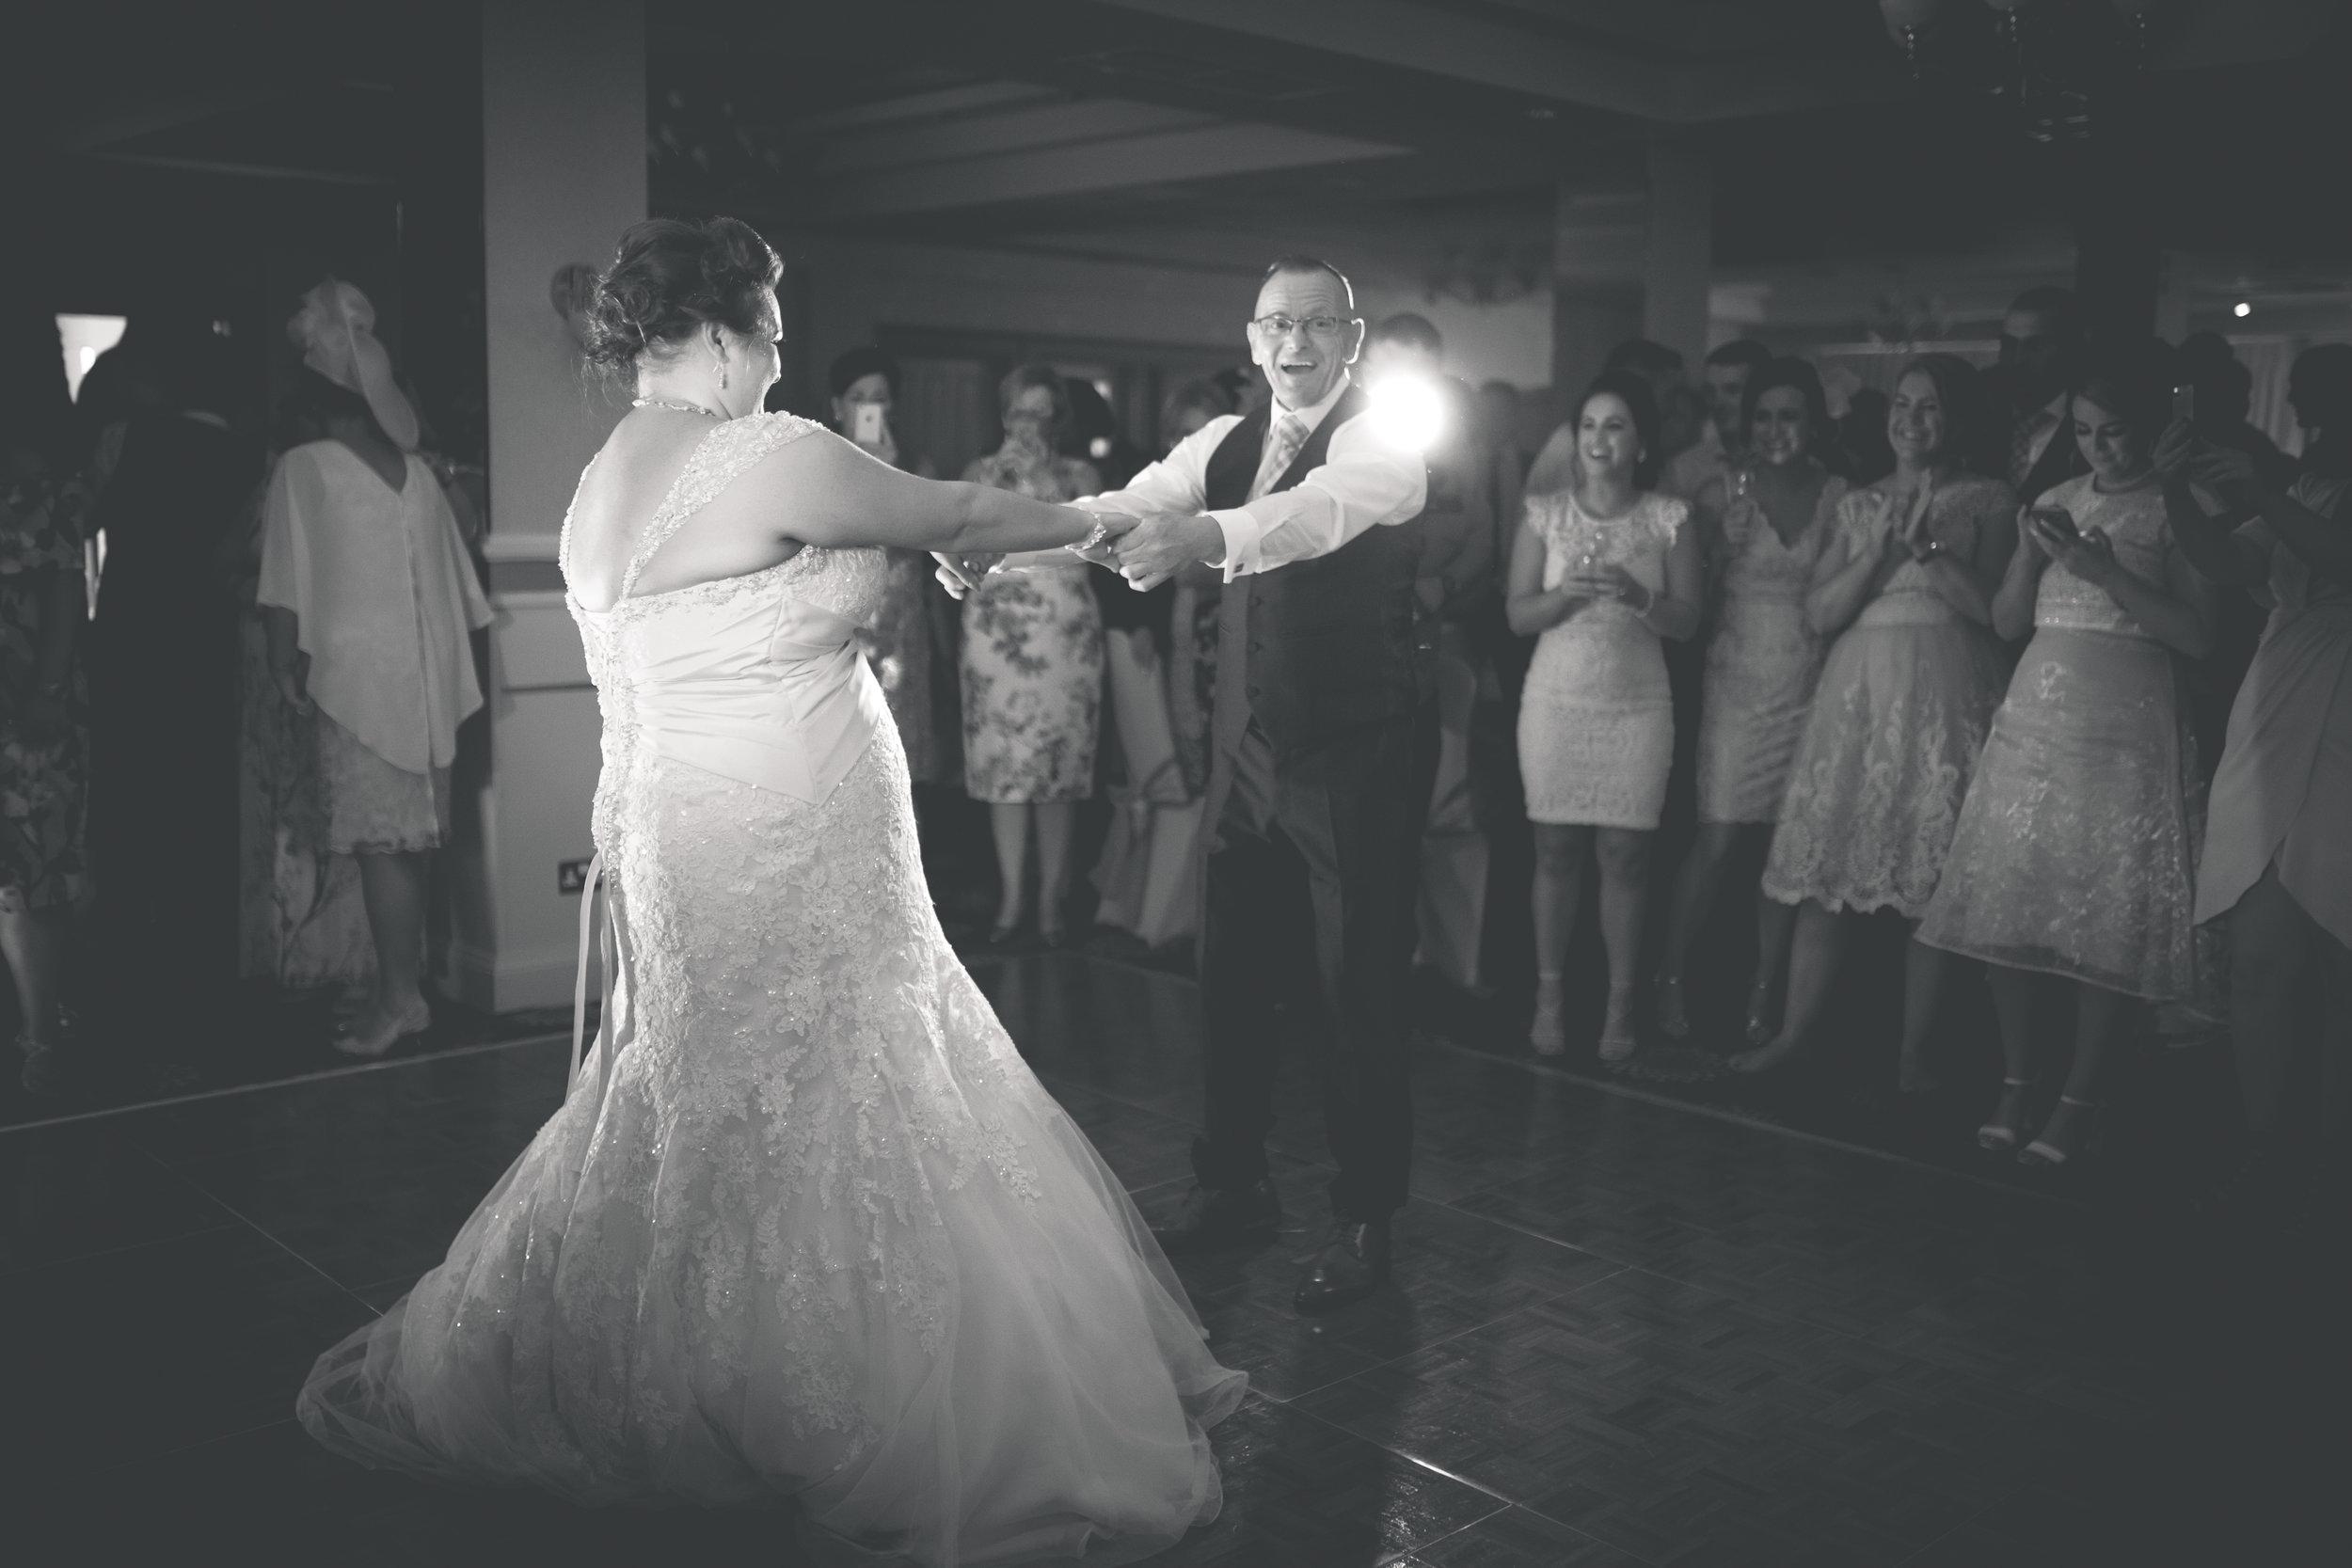 Antoinette & Stephen - First Dance | Brian McEwan Photography | Wedding Photographer Northern Ireland 39.jpg